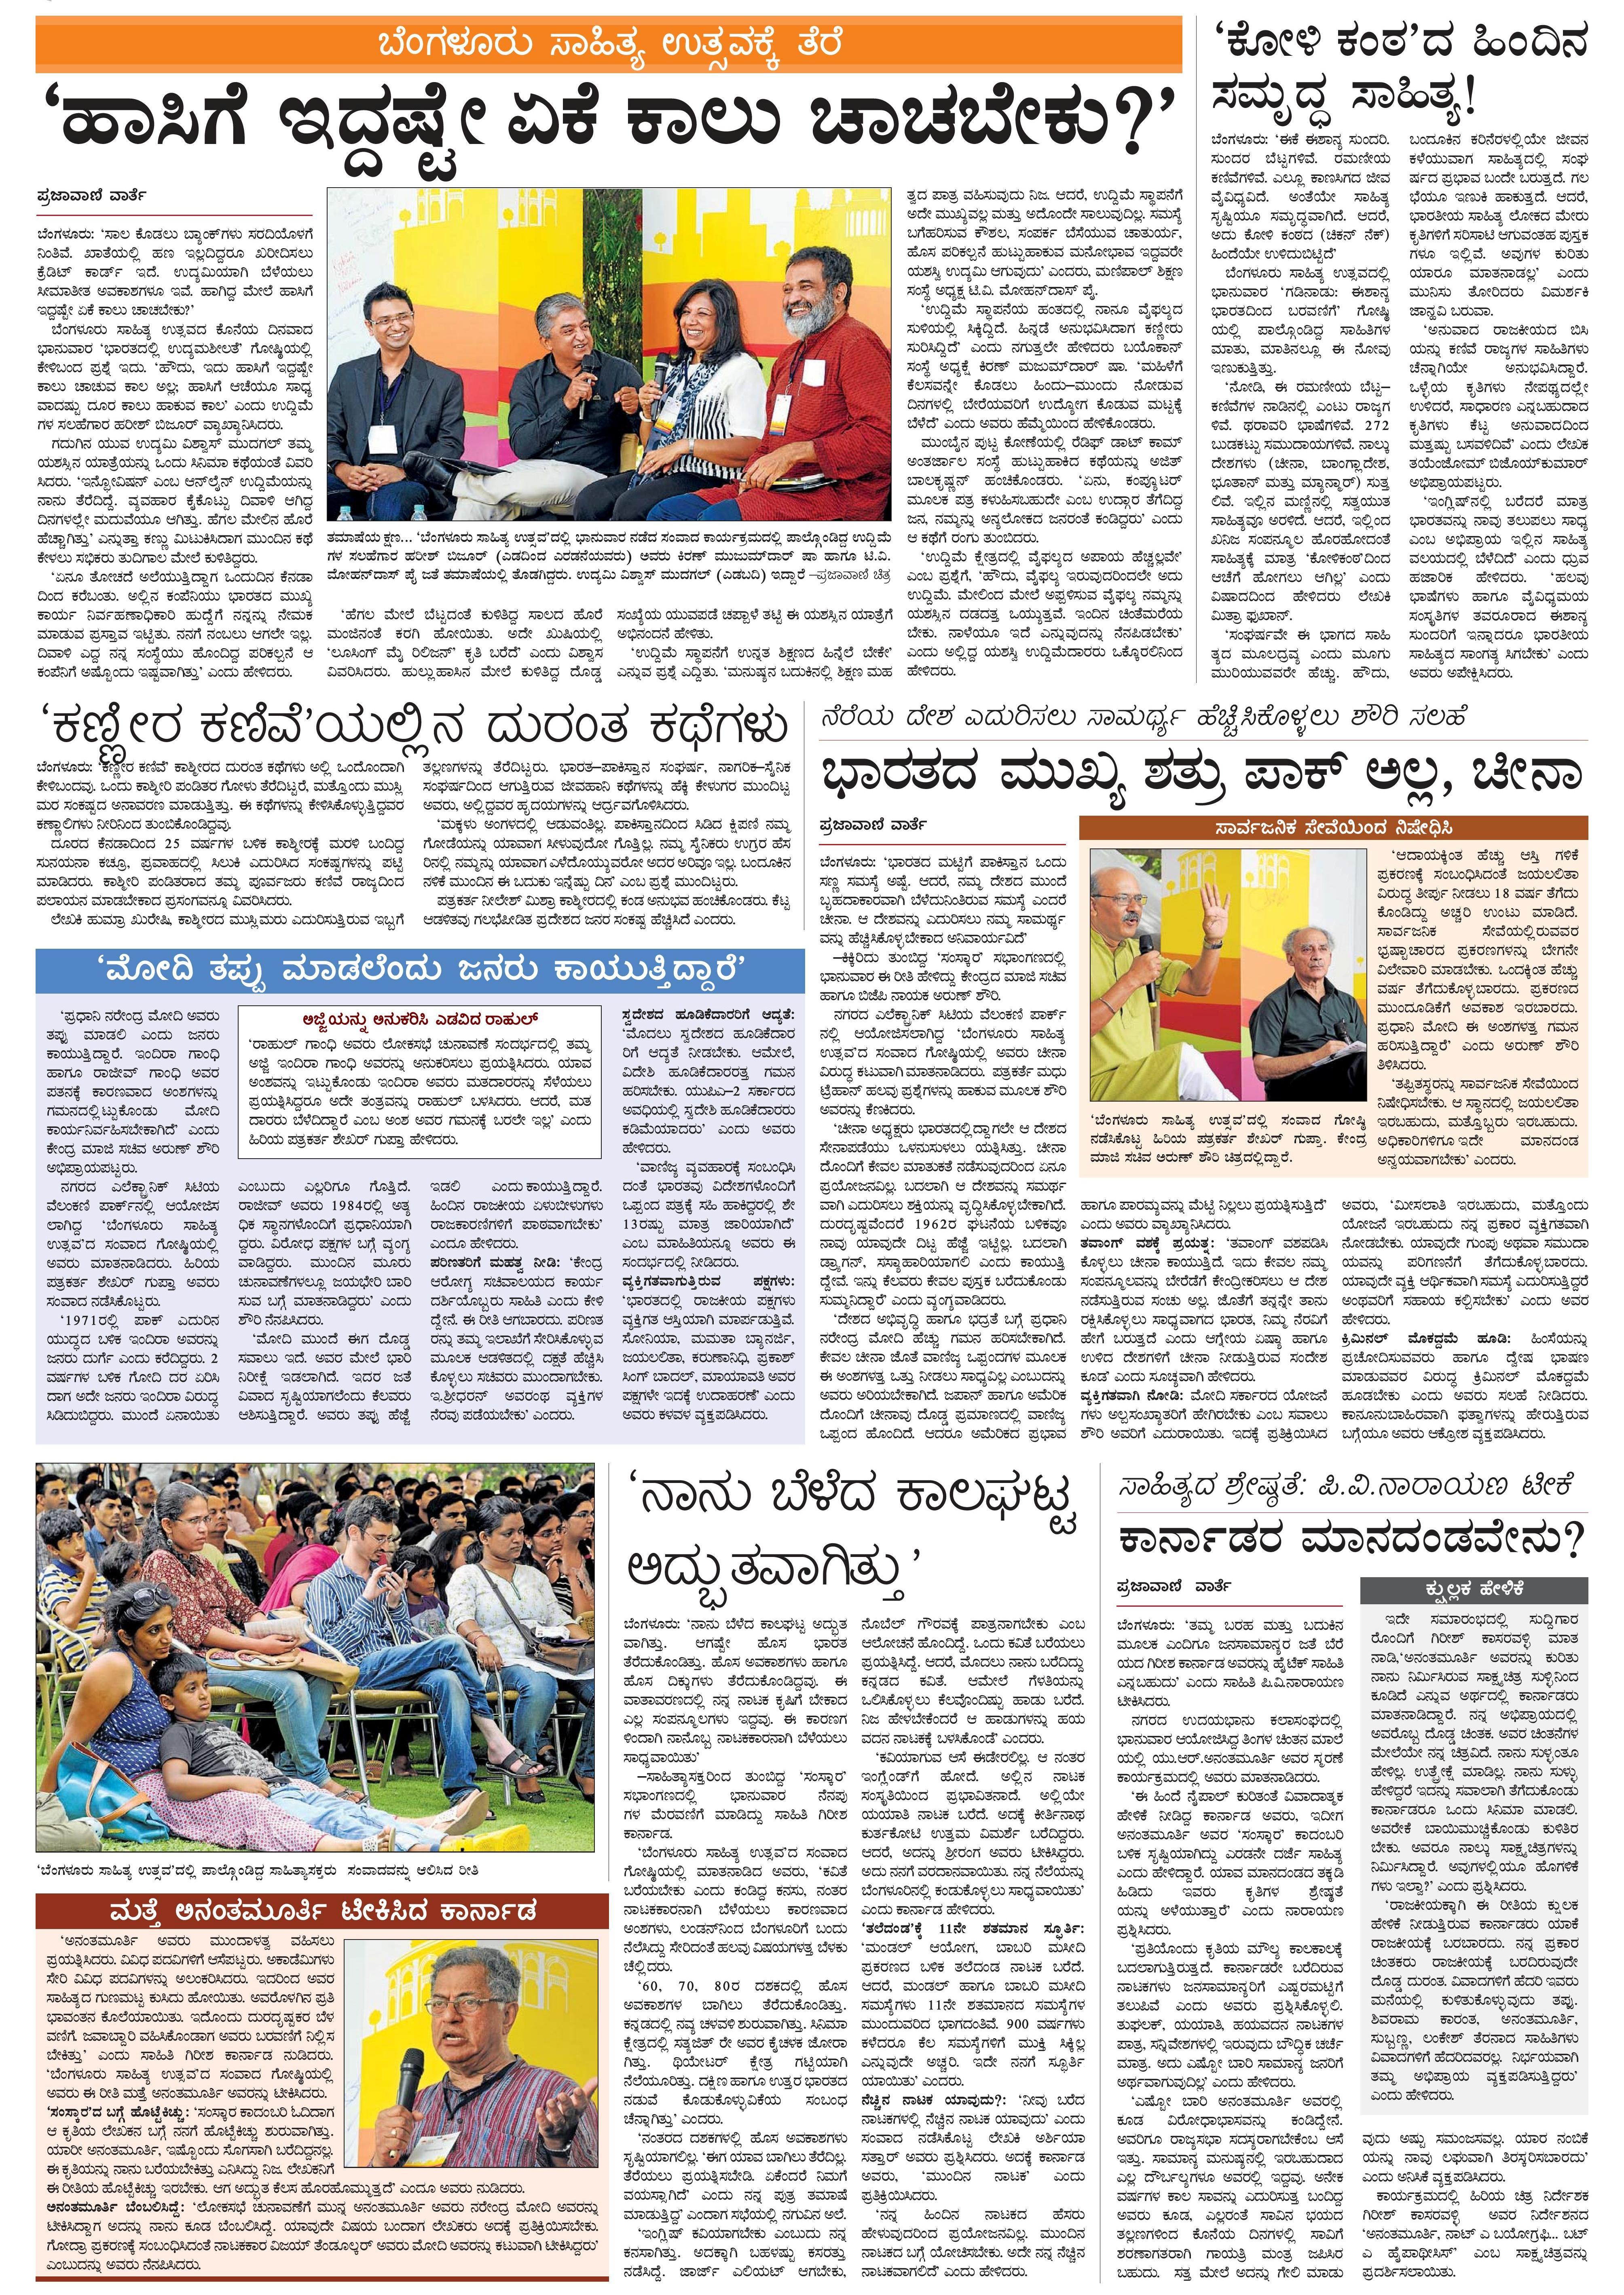 Bangalore Literature Fest session